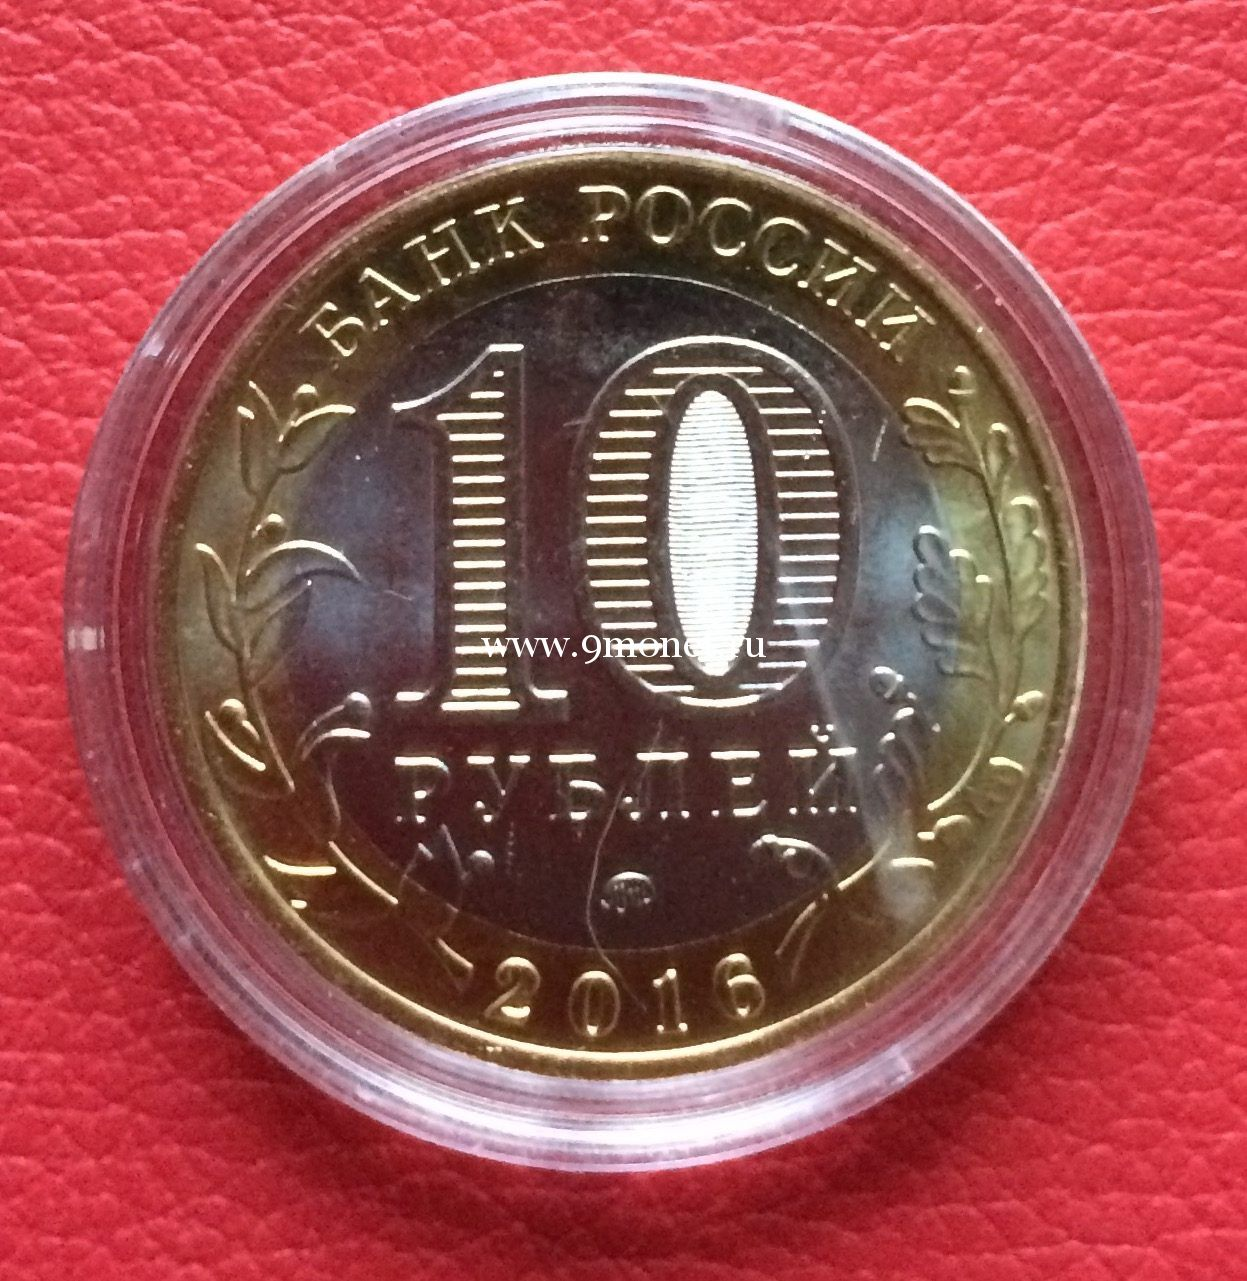 Сувенирная монета 10 рублей. Чемпионат мира по футболу FIFA 2018 года. Кубок Федерации.